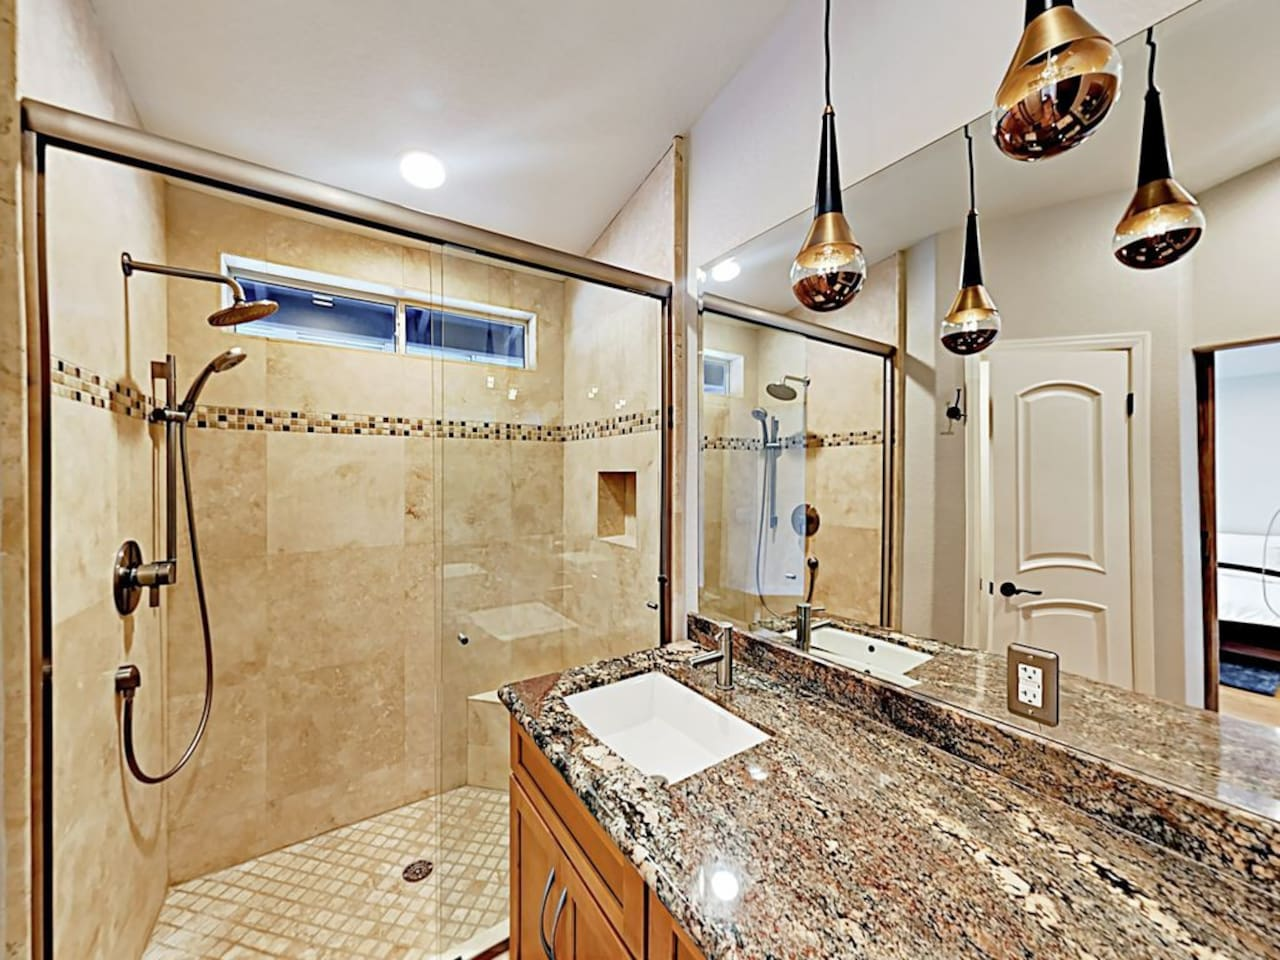 Travertine tile and glossy granite adorns the en-suite master bathroom